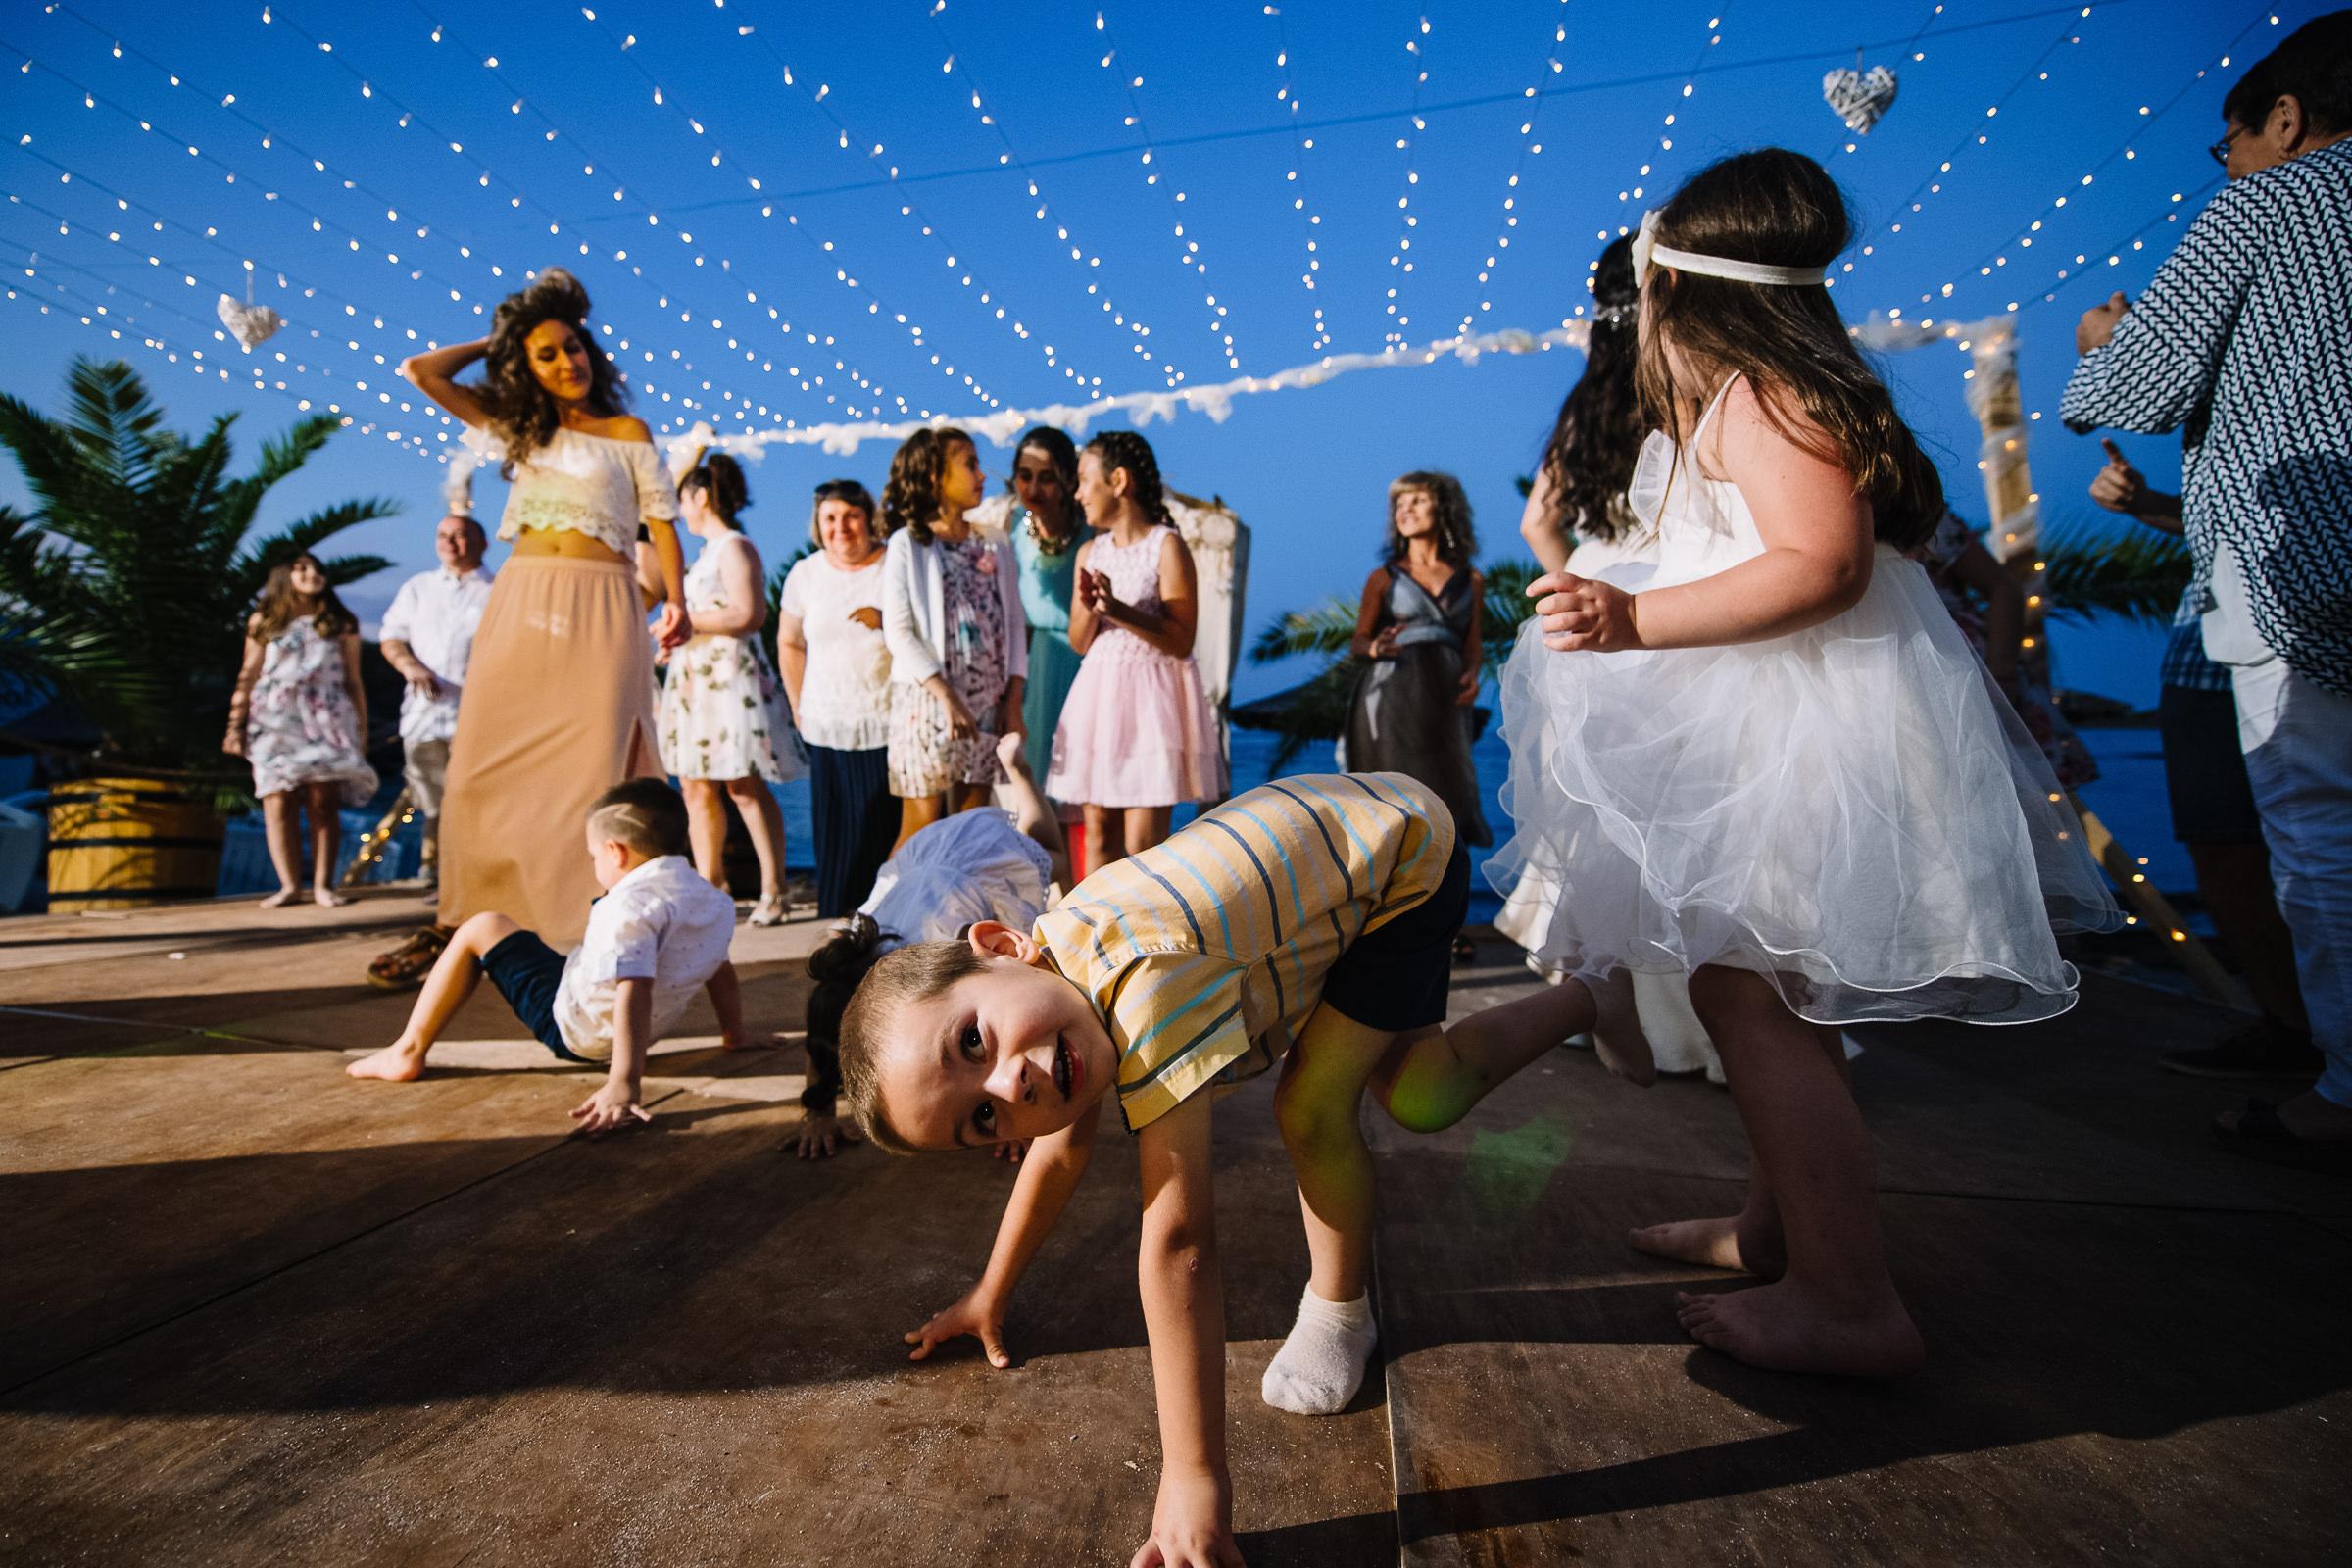 Kid fun under strings of light - photo by Deliysky Studio